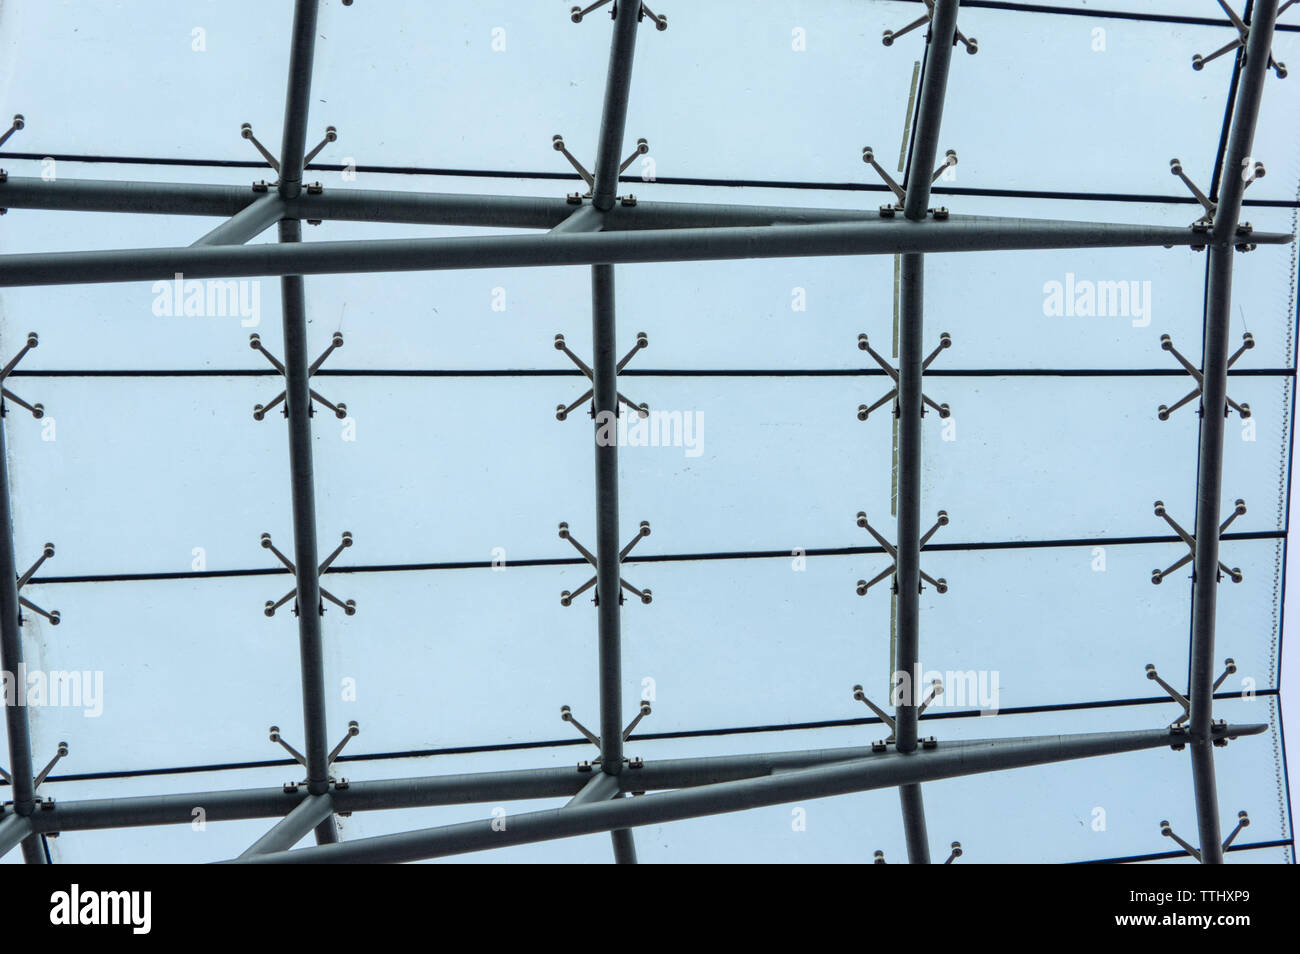 roof segments of Olympiastadion Berlin against sky - Stock Image